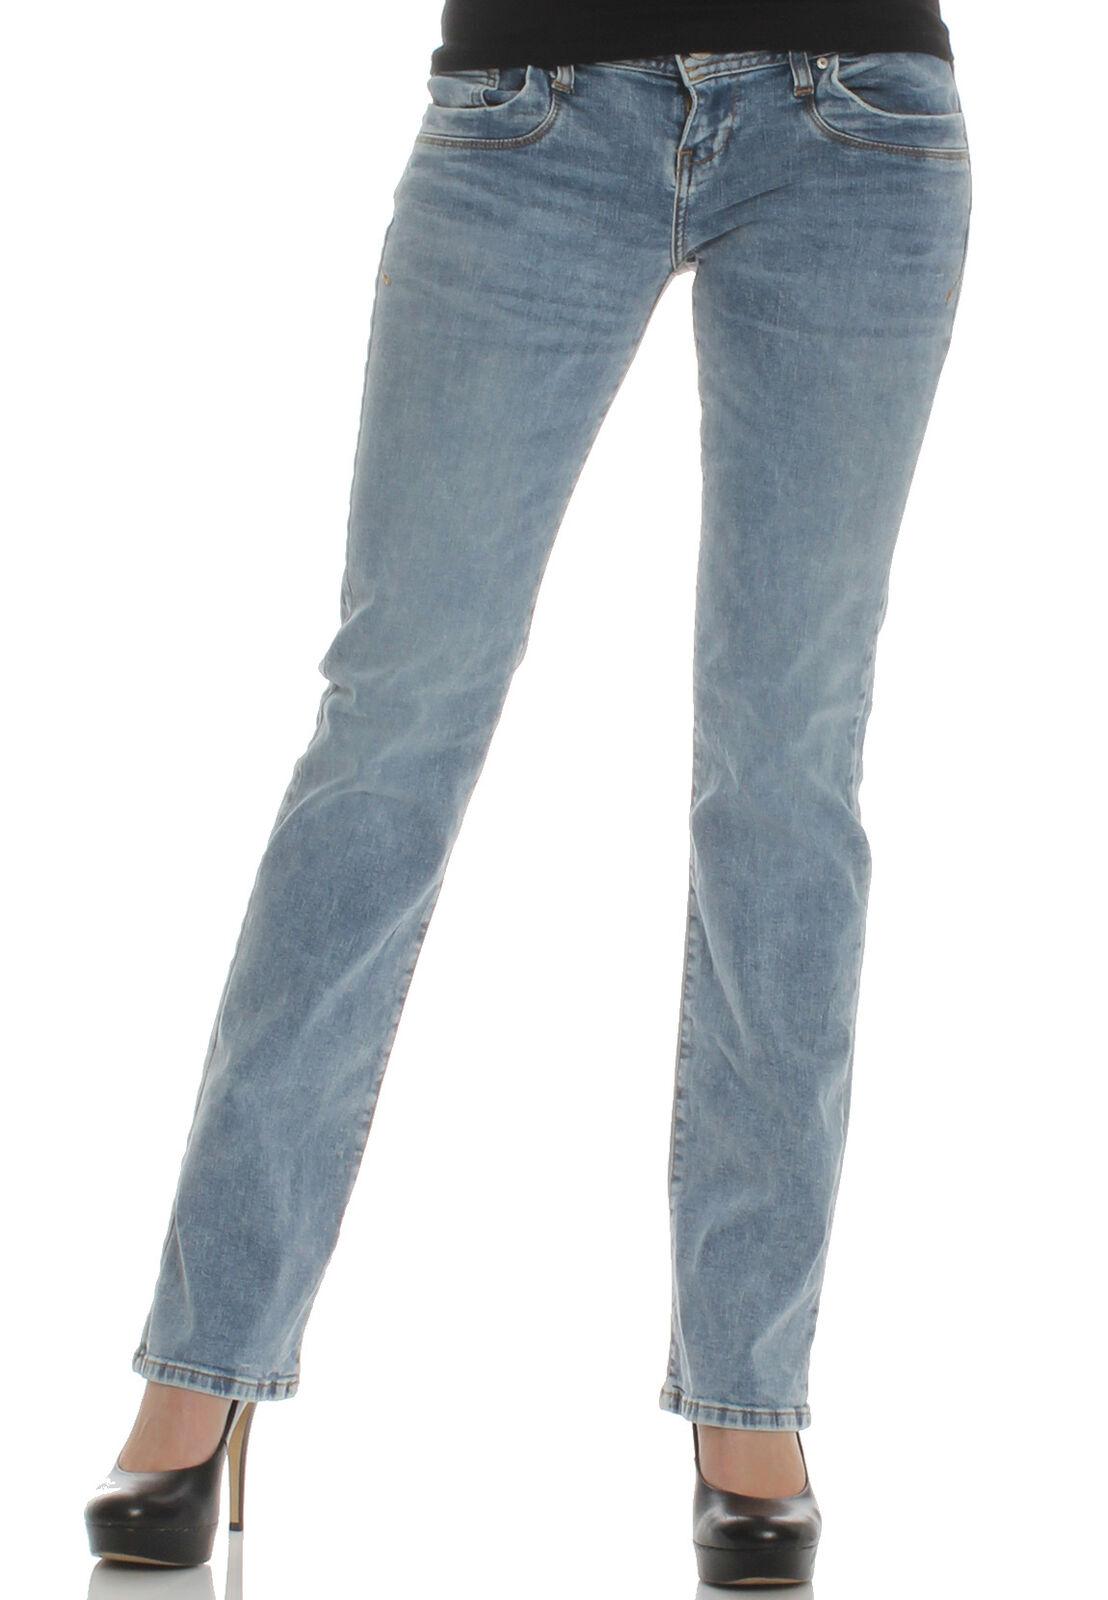 LTB Damen Jeans VALERIE Latona Latona Latona Wash Hellblau 0ac417